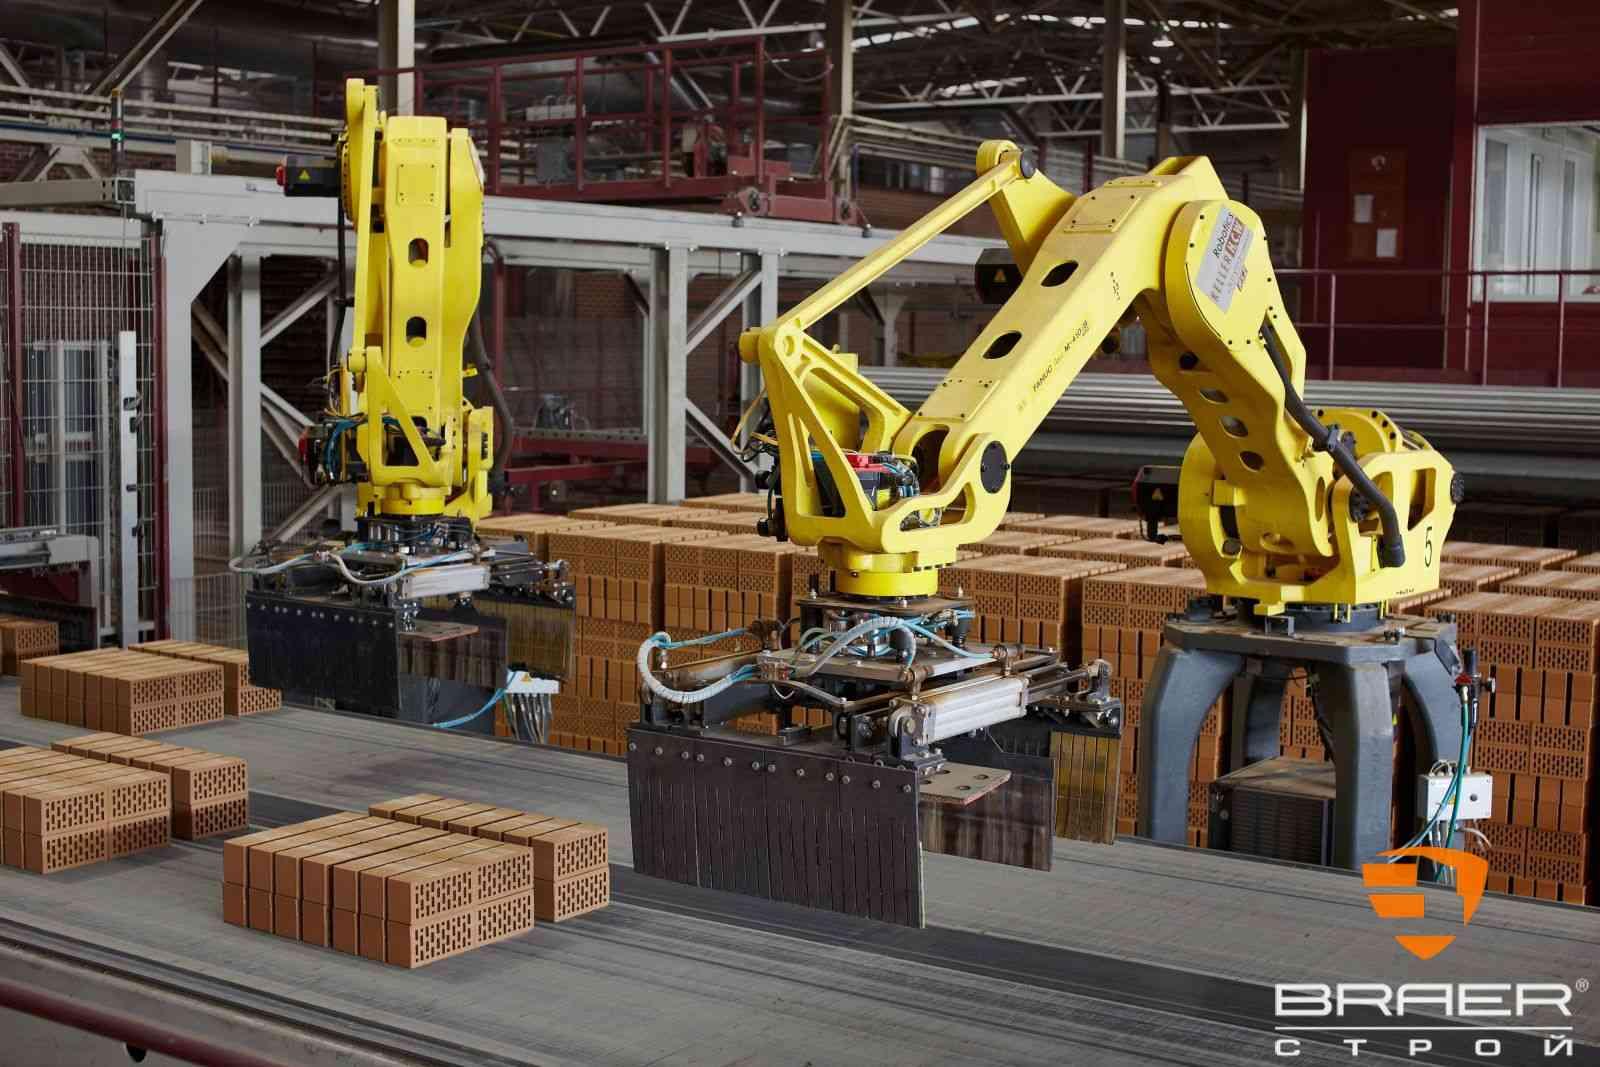 Кирпичный завод - роботизированное производство кирпича